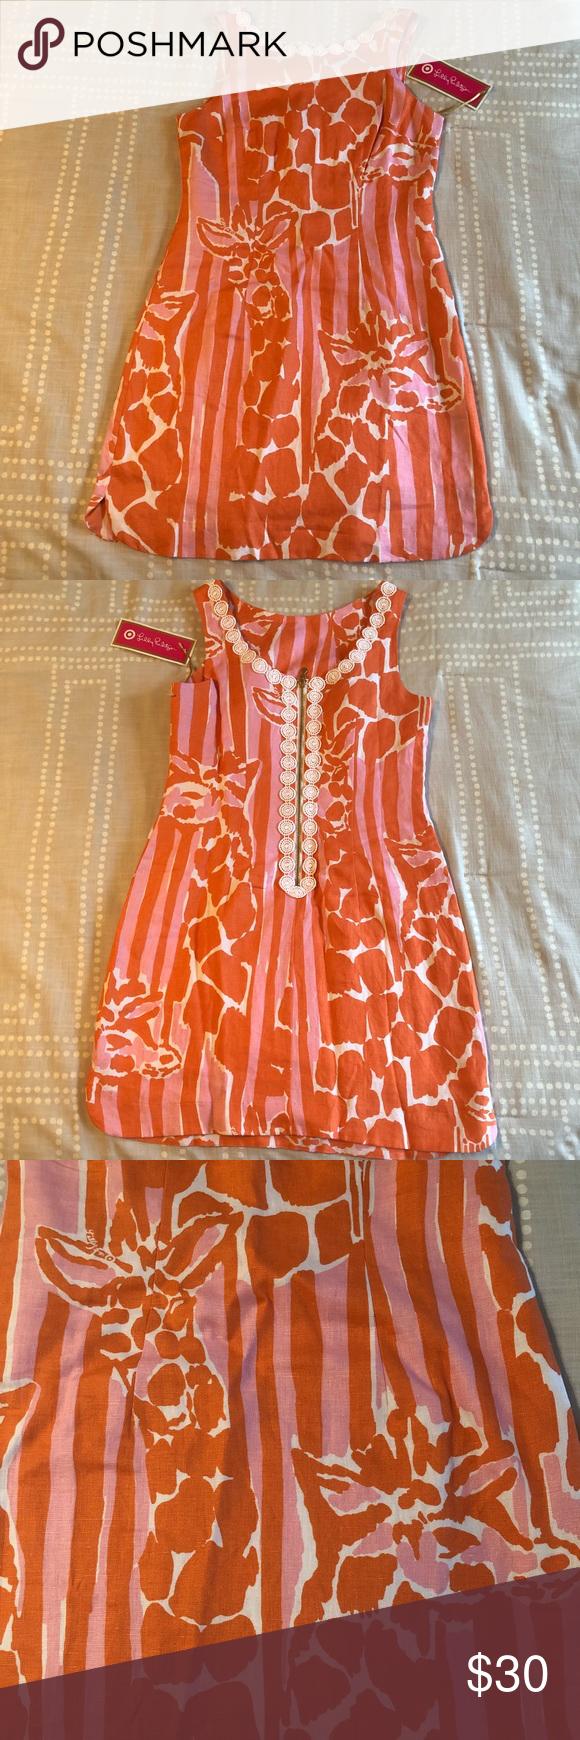 Lilly Pulitzer For Target Orange Dress Nwt Sz 4 Giraffe Print Dress Orange Dress Clothes Design [ 1740 x 580 Pixel ]